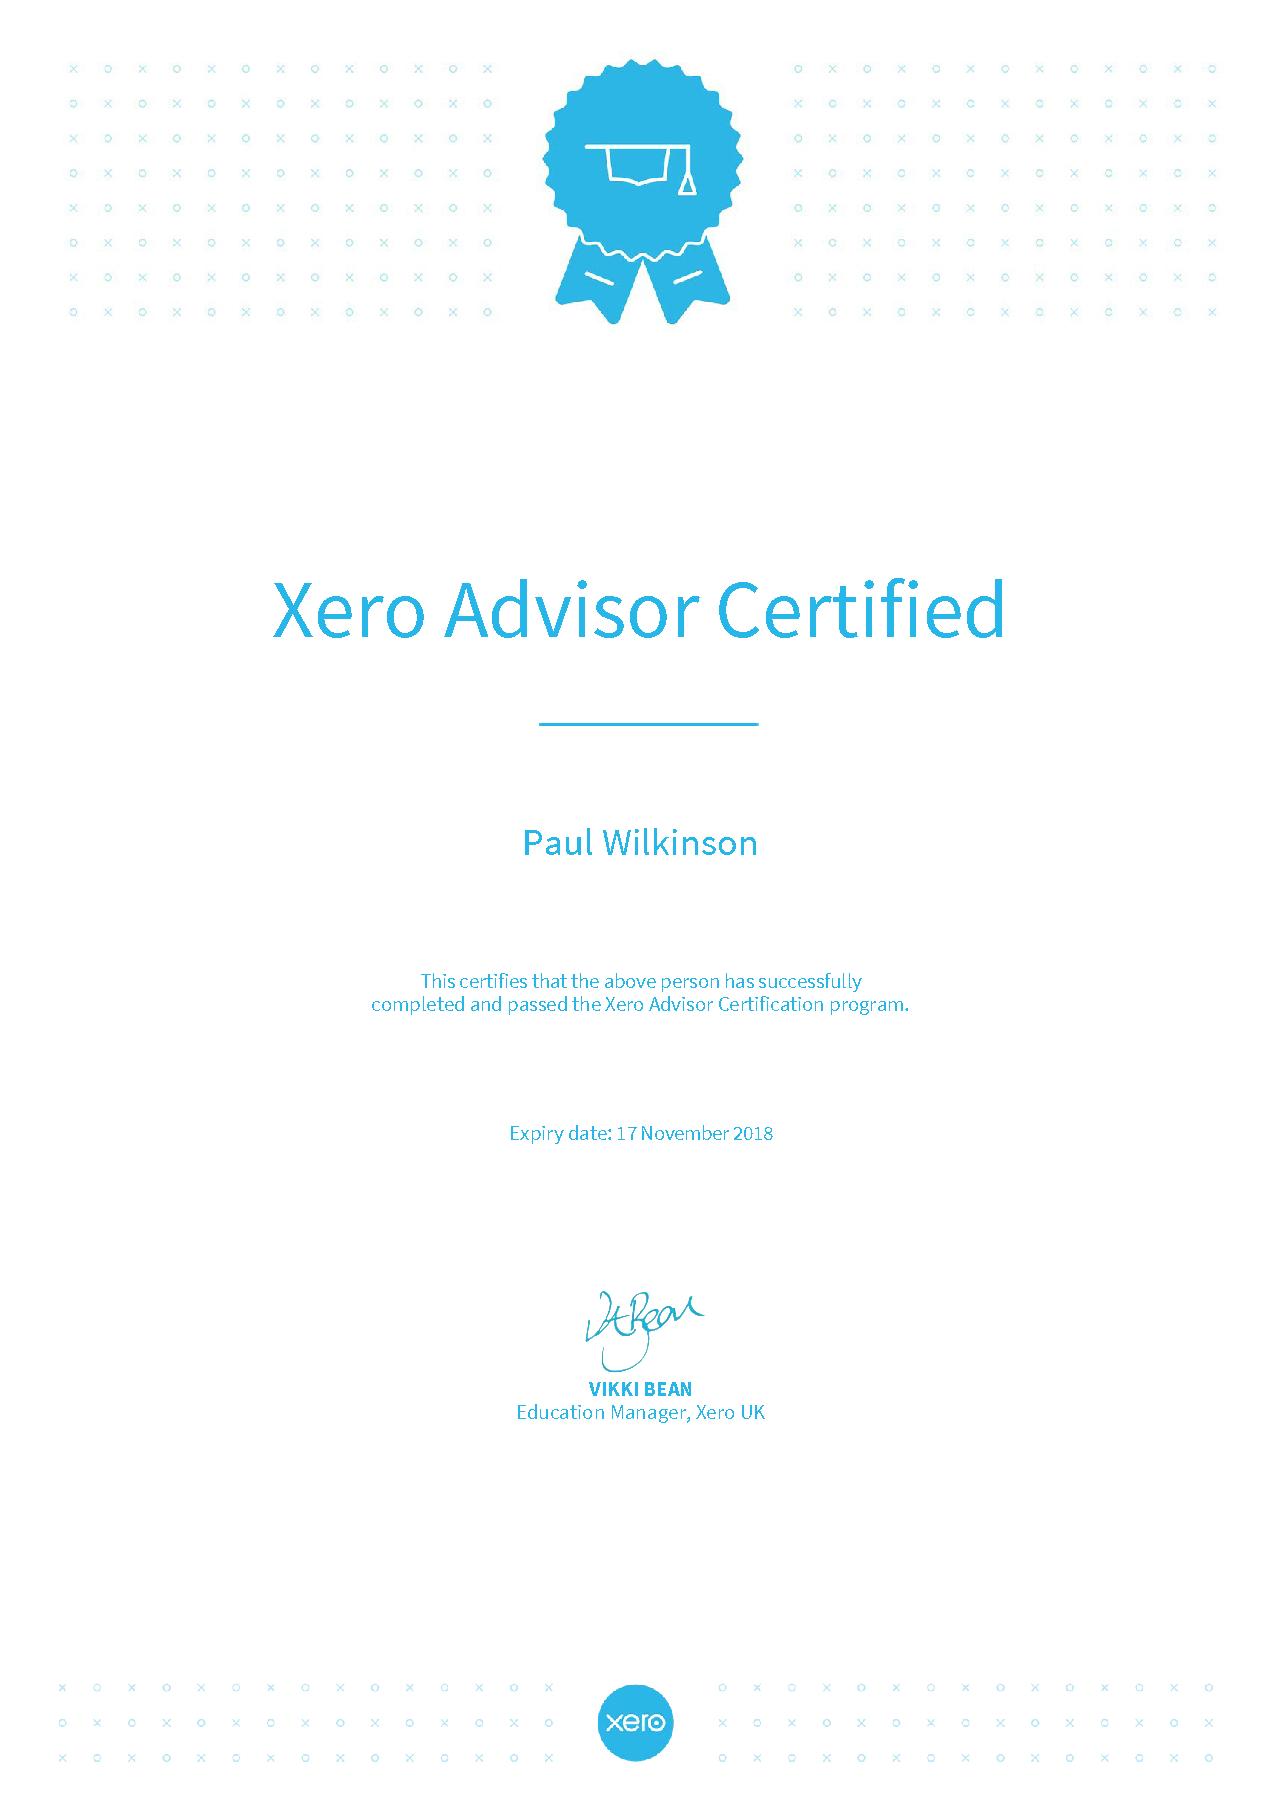 Xero silver partner and xero certified advisor for another year xero silver partner and xero certified advisor for another year 1betcityfo Gallery